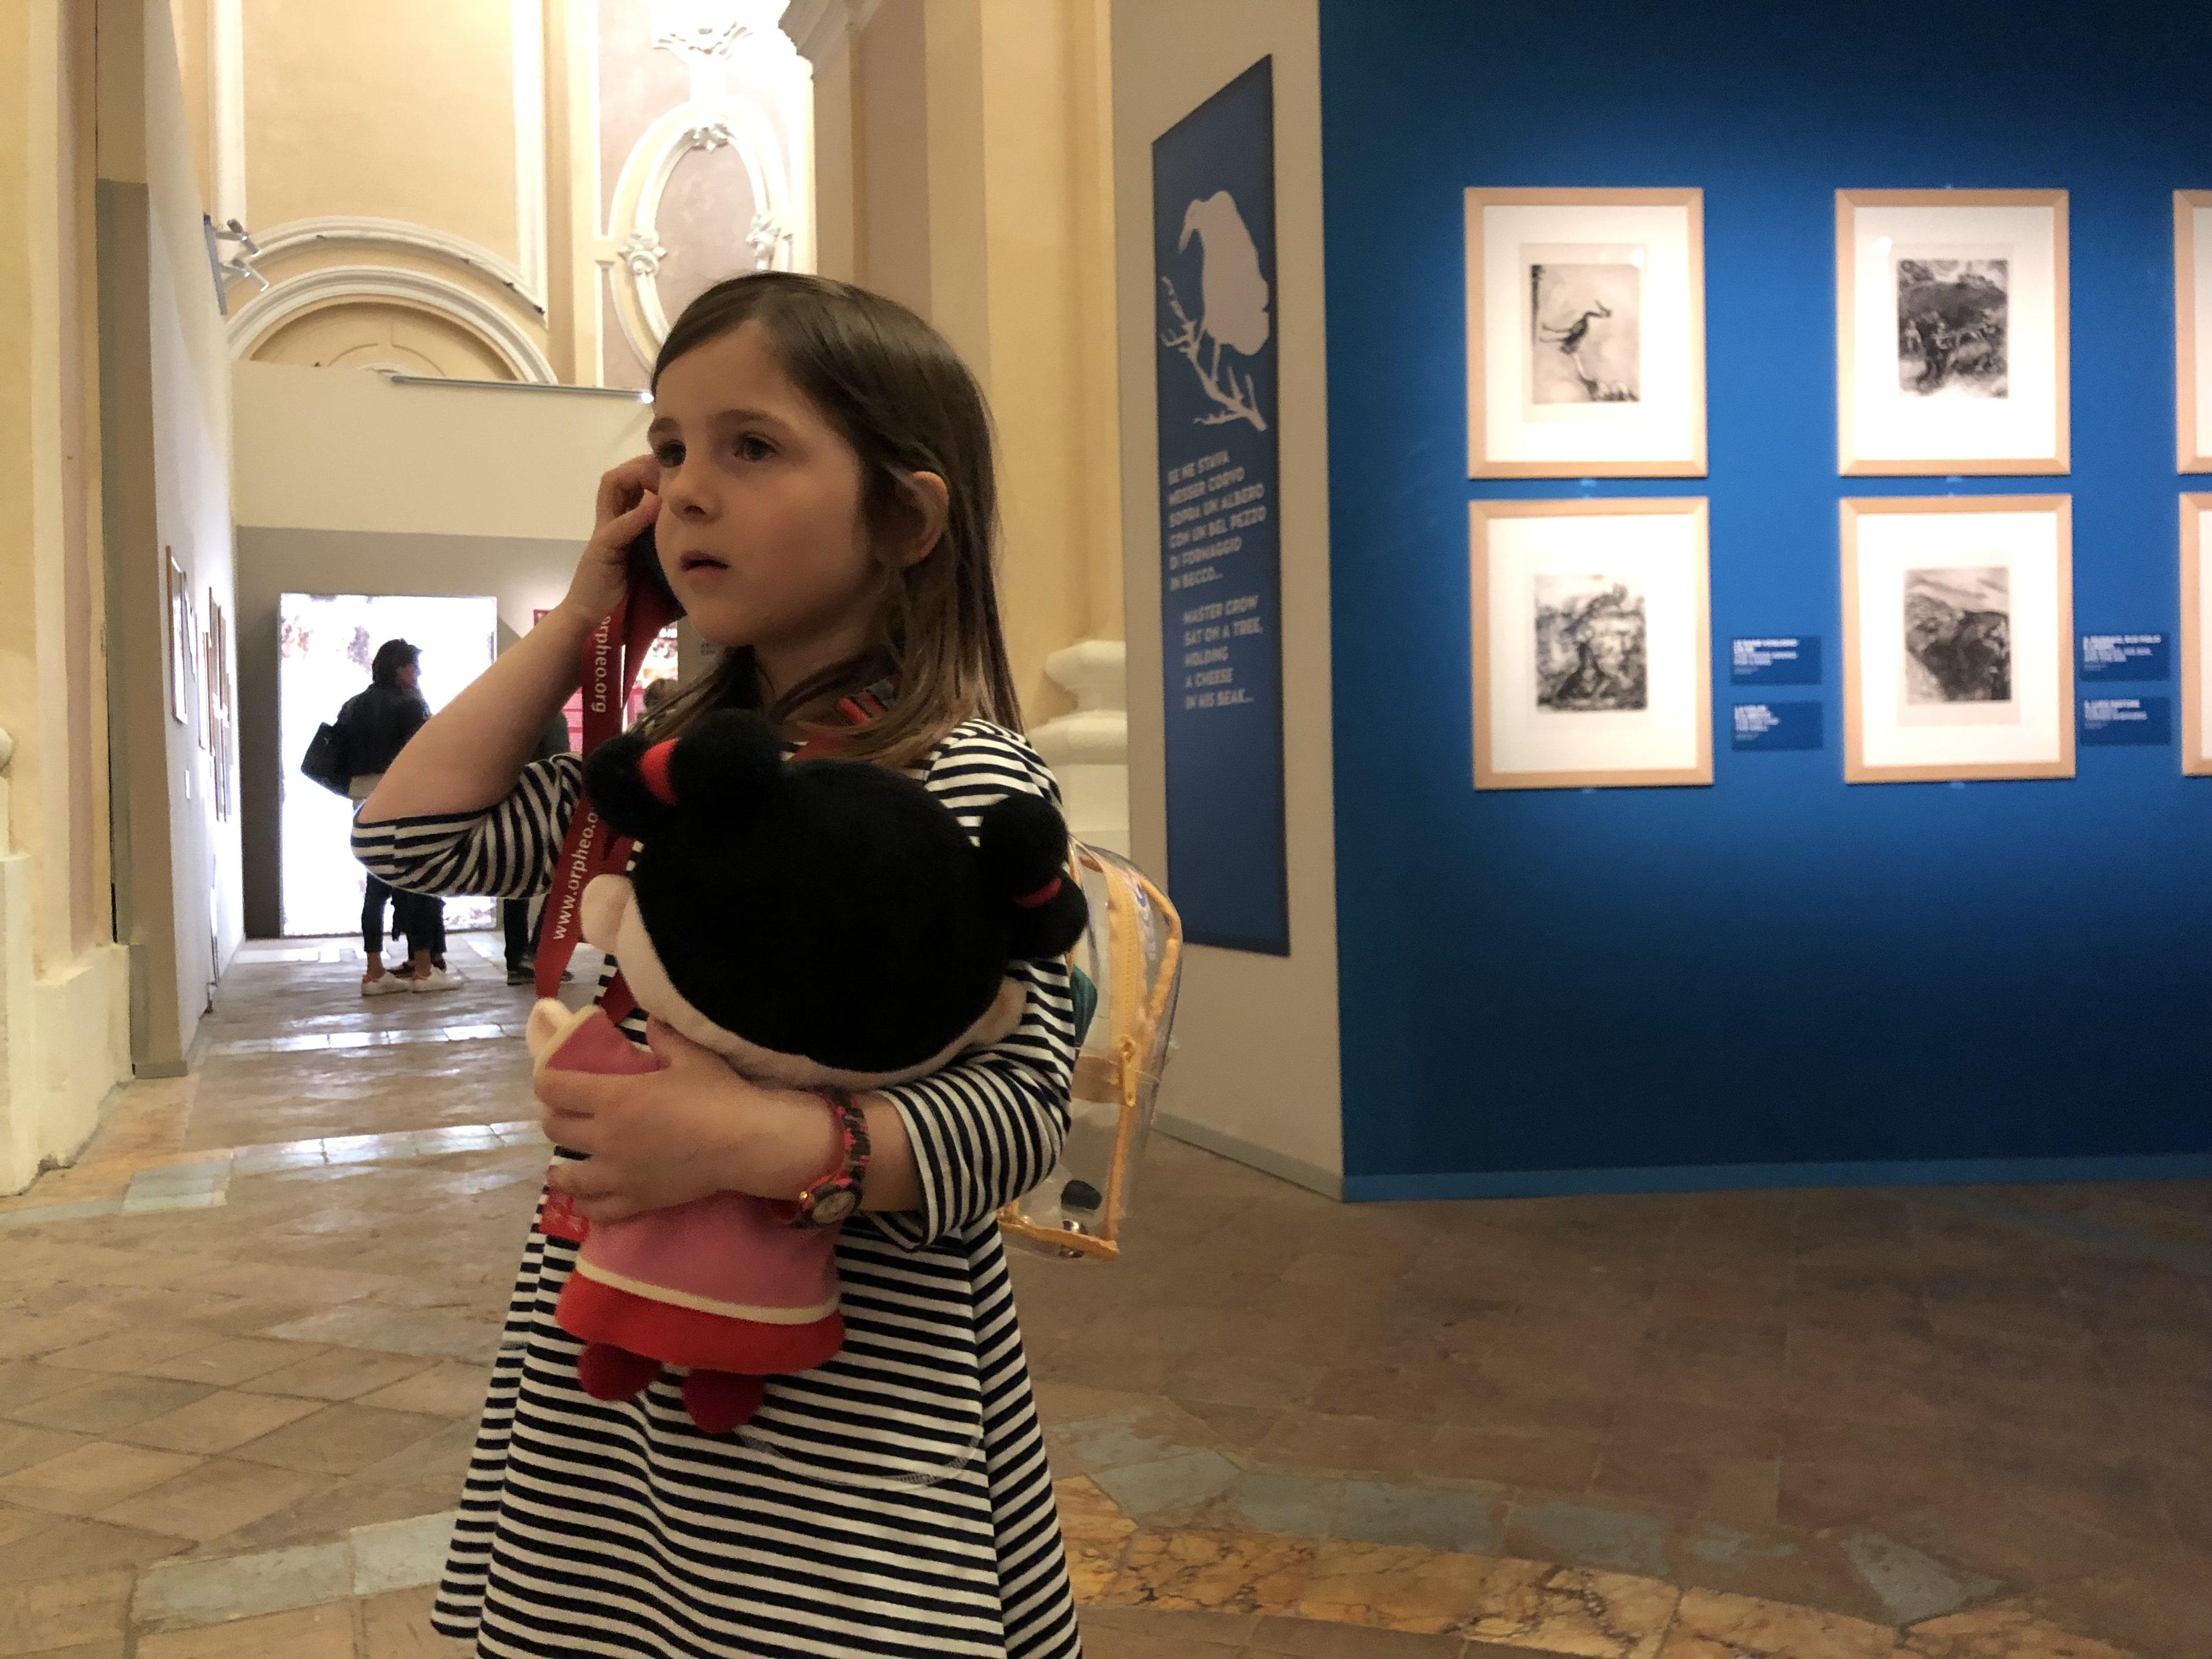 Chagall Napoli